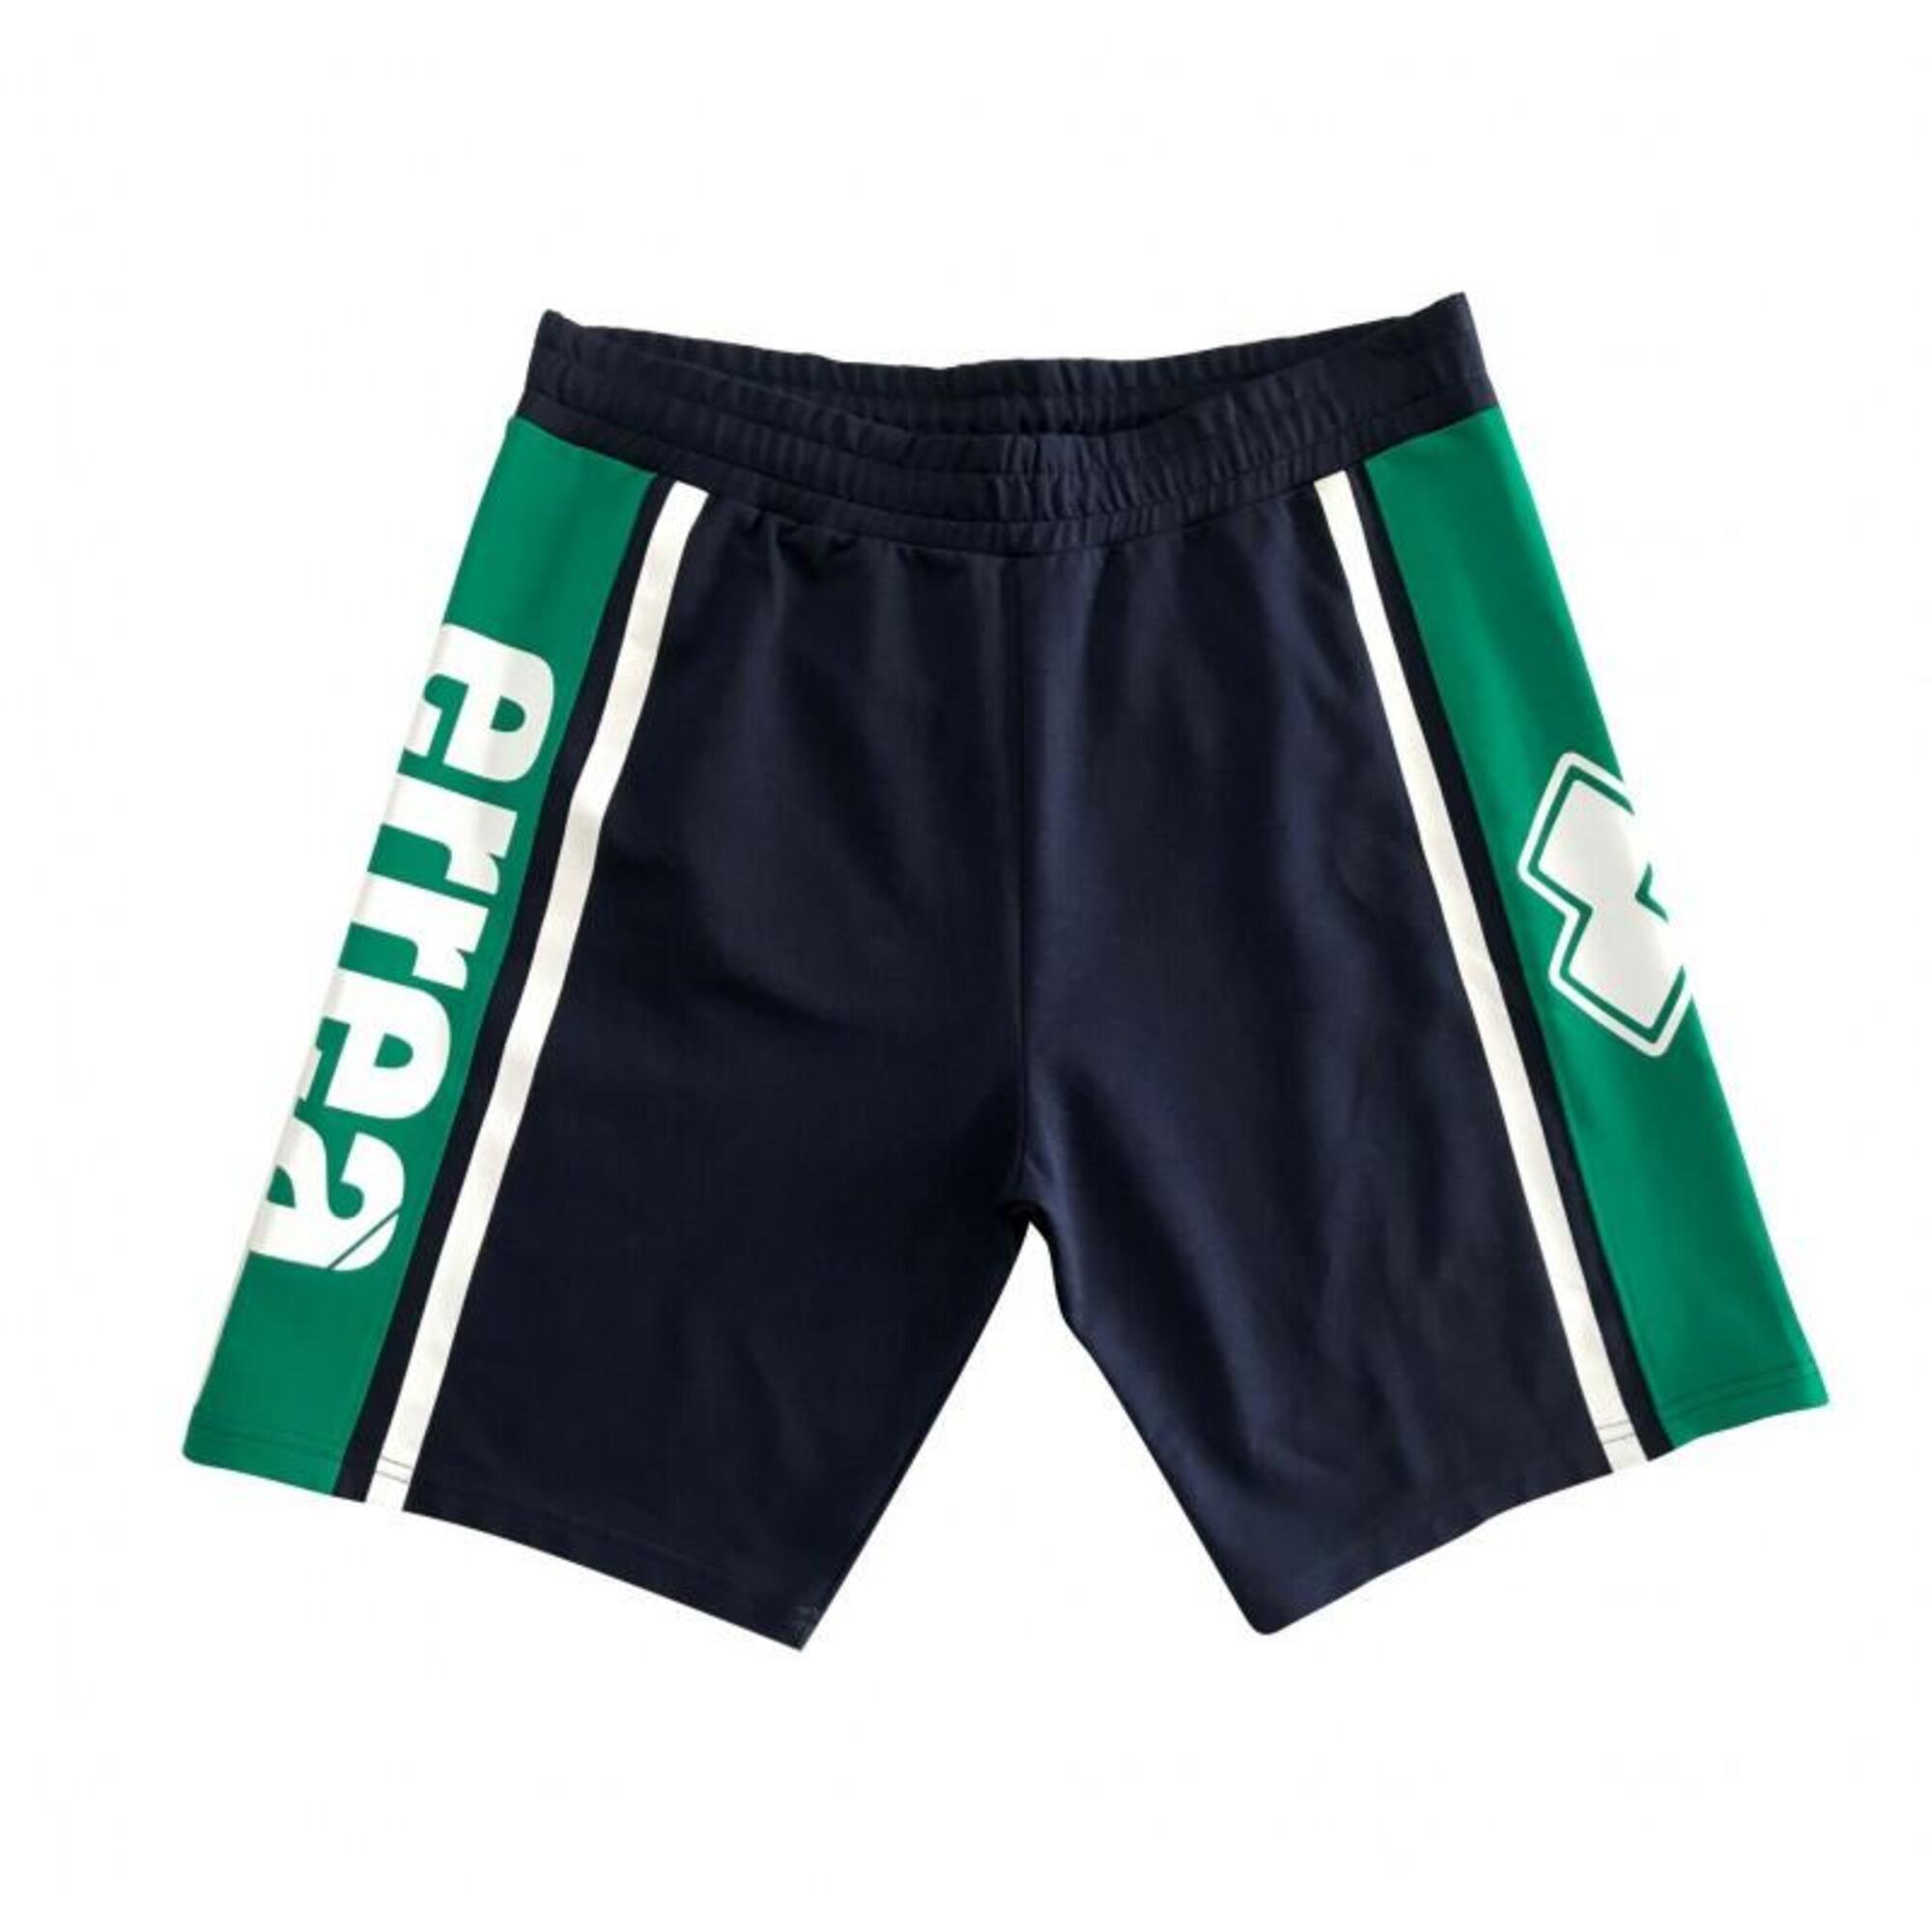 Errea sport fusion shorts